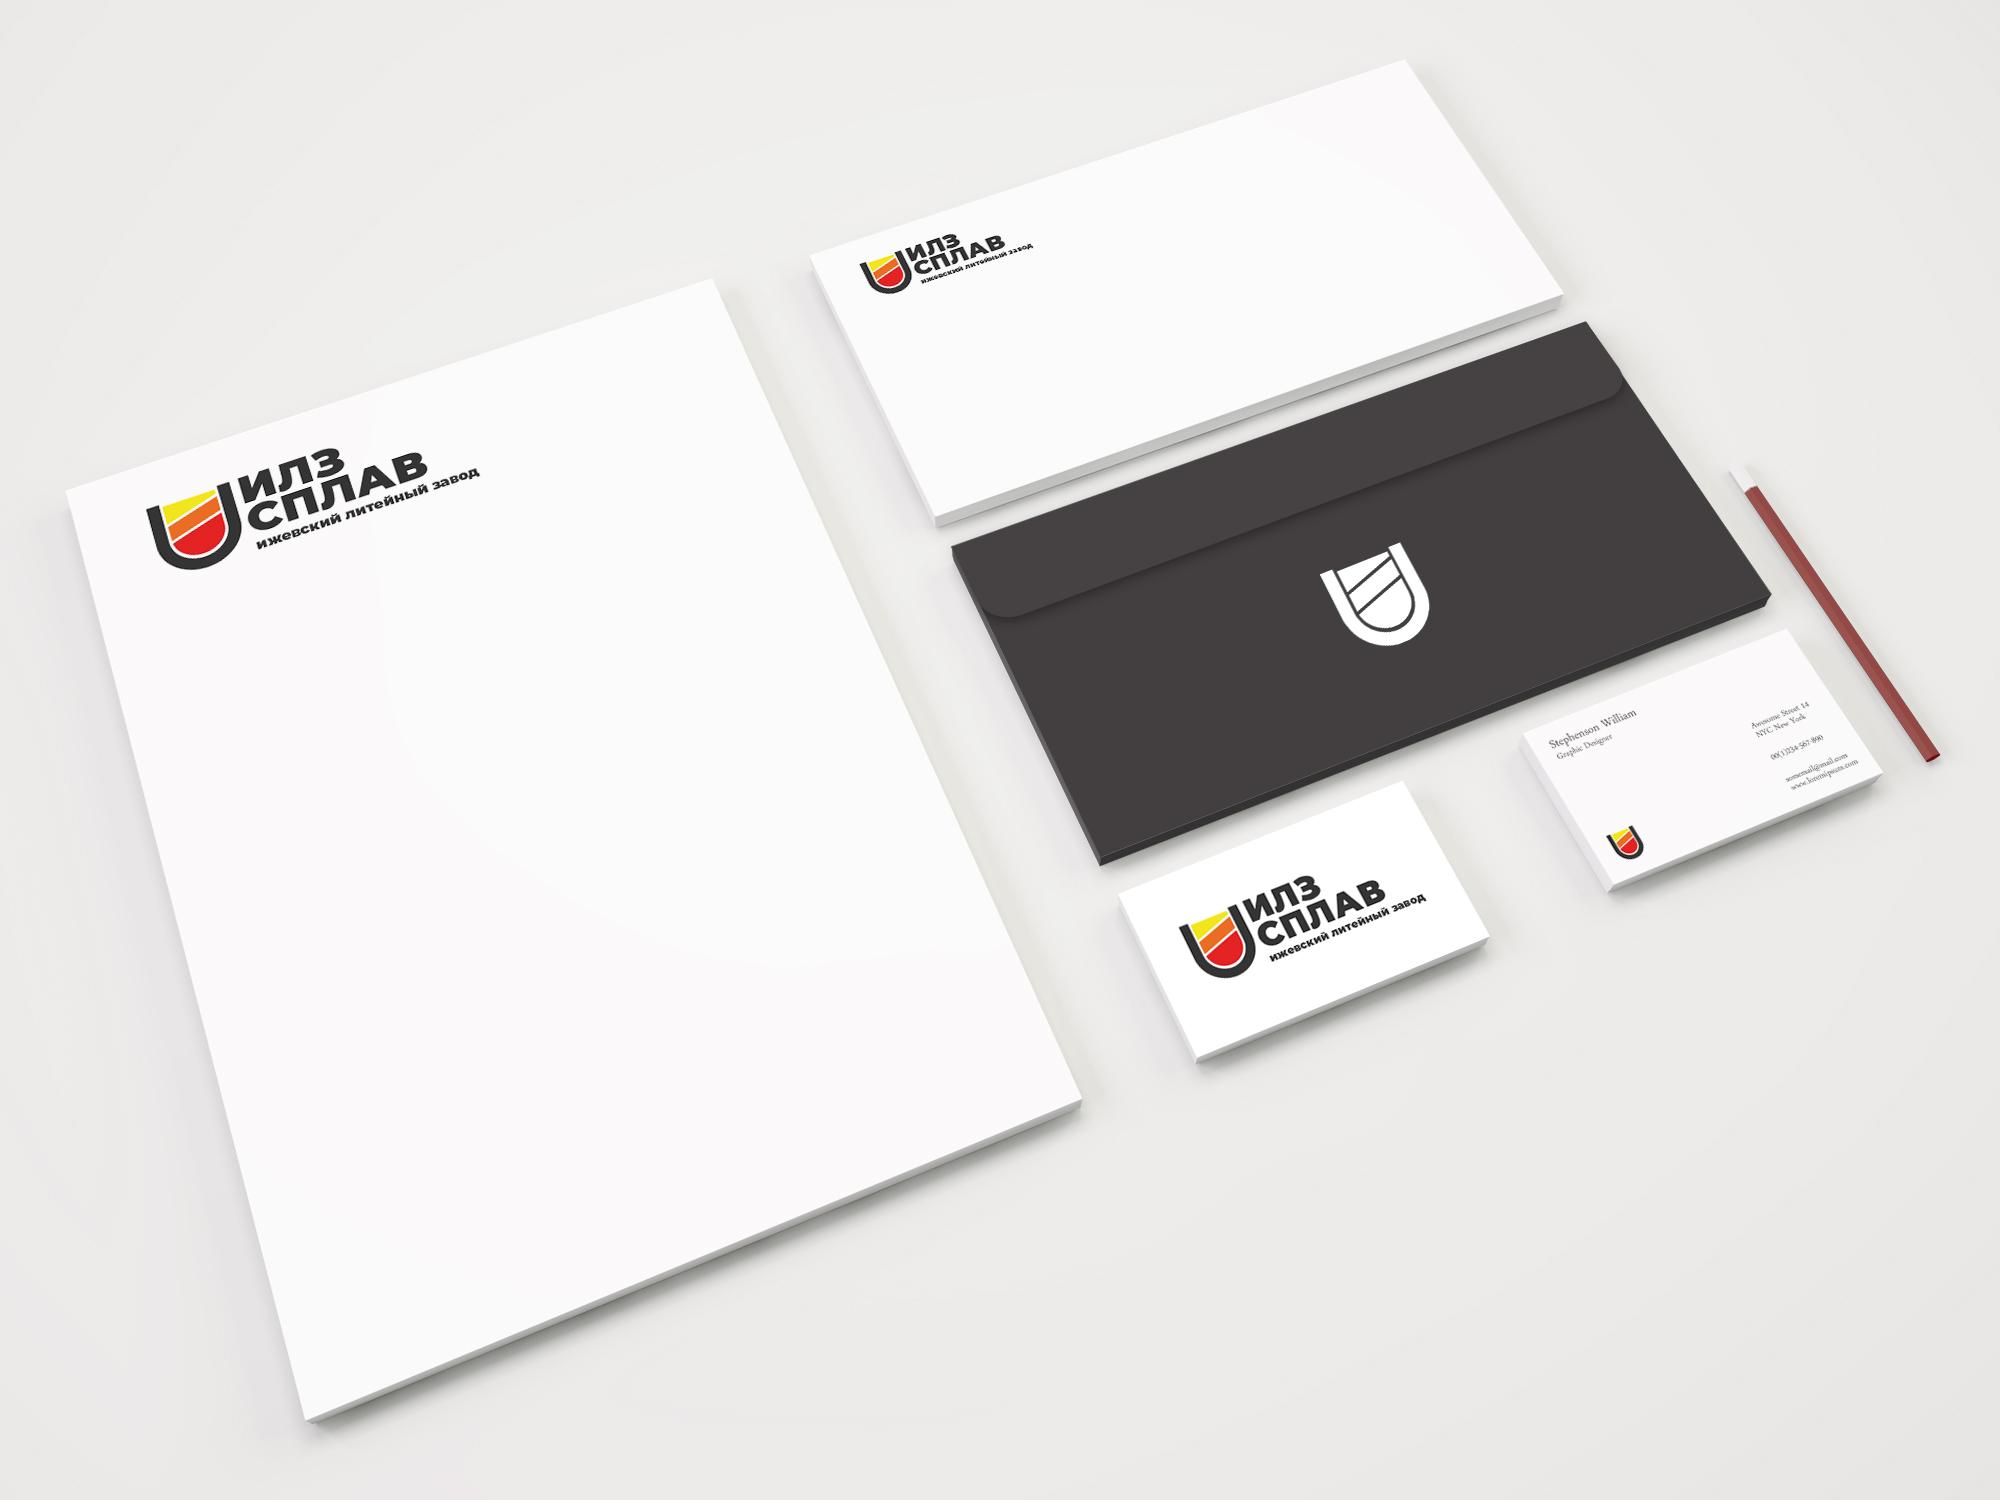 Разработать логотип для литейного завода фото f_0915afae1ef9f219.jpg